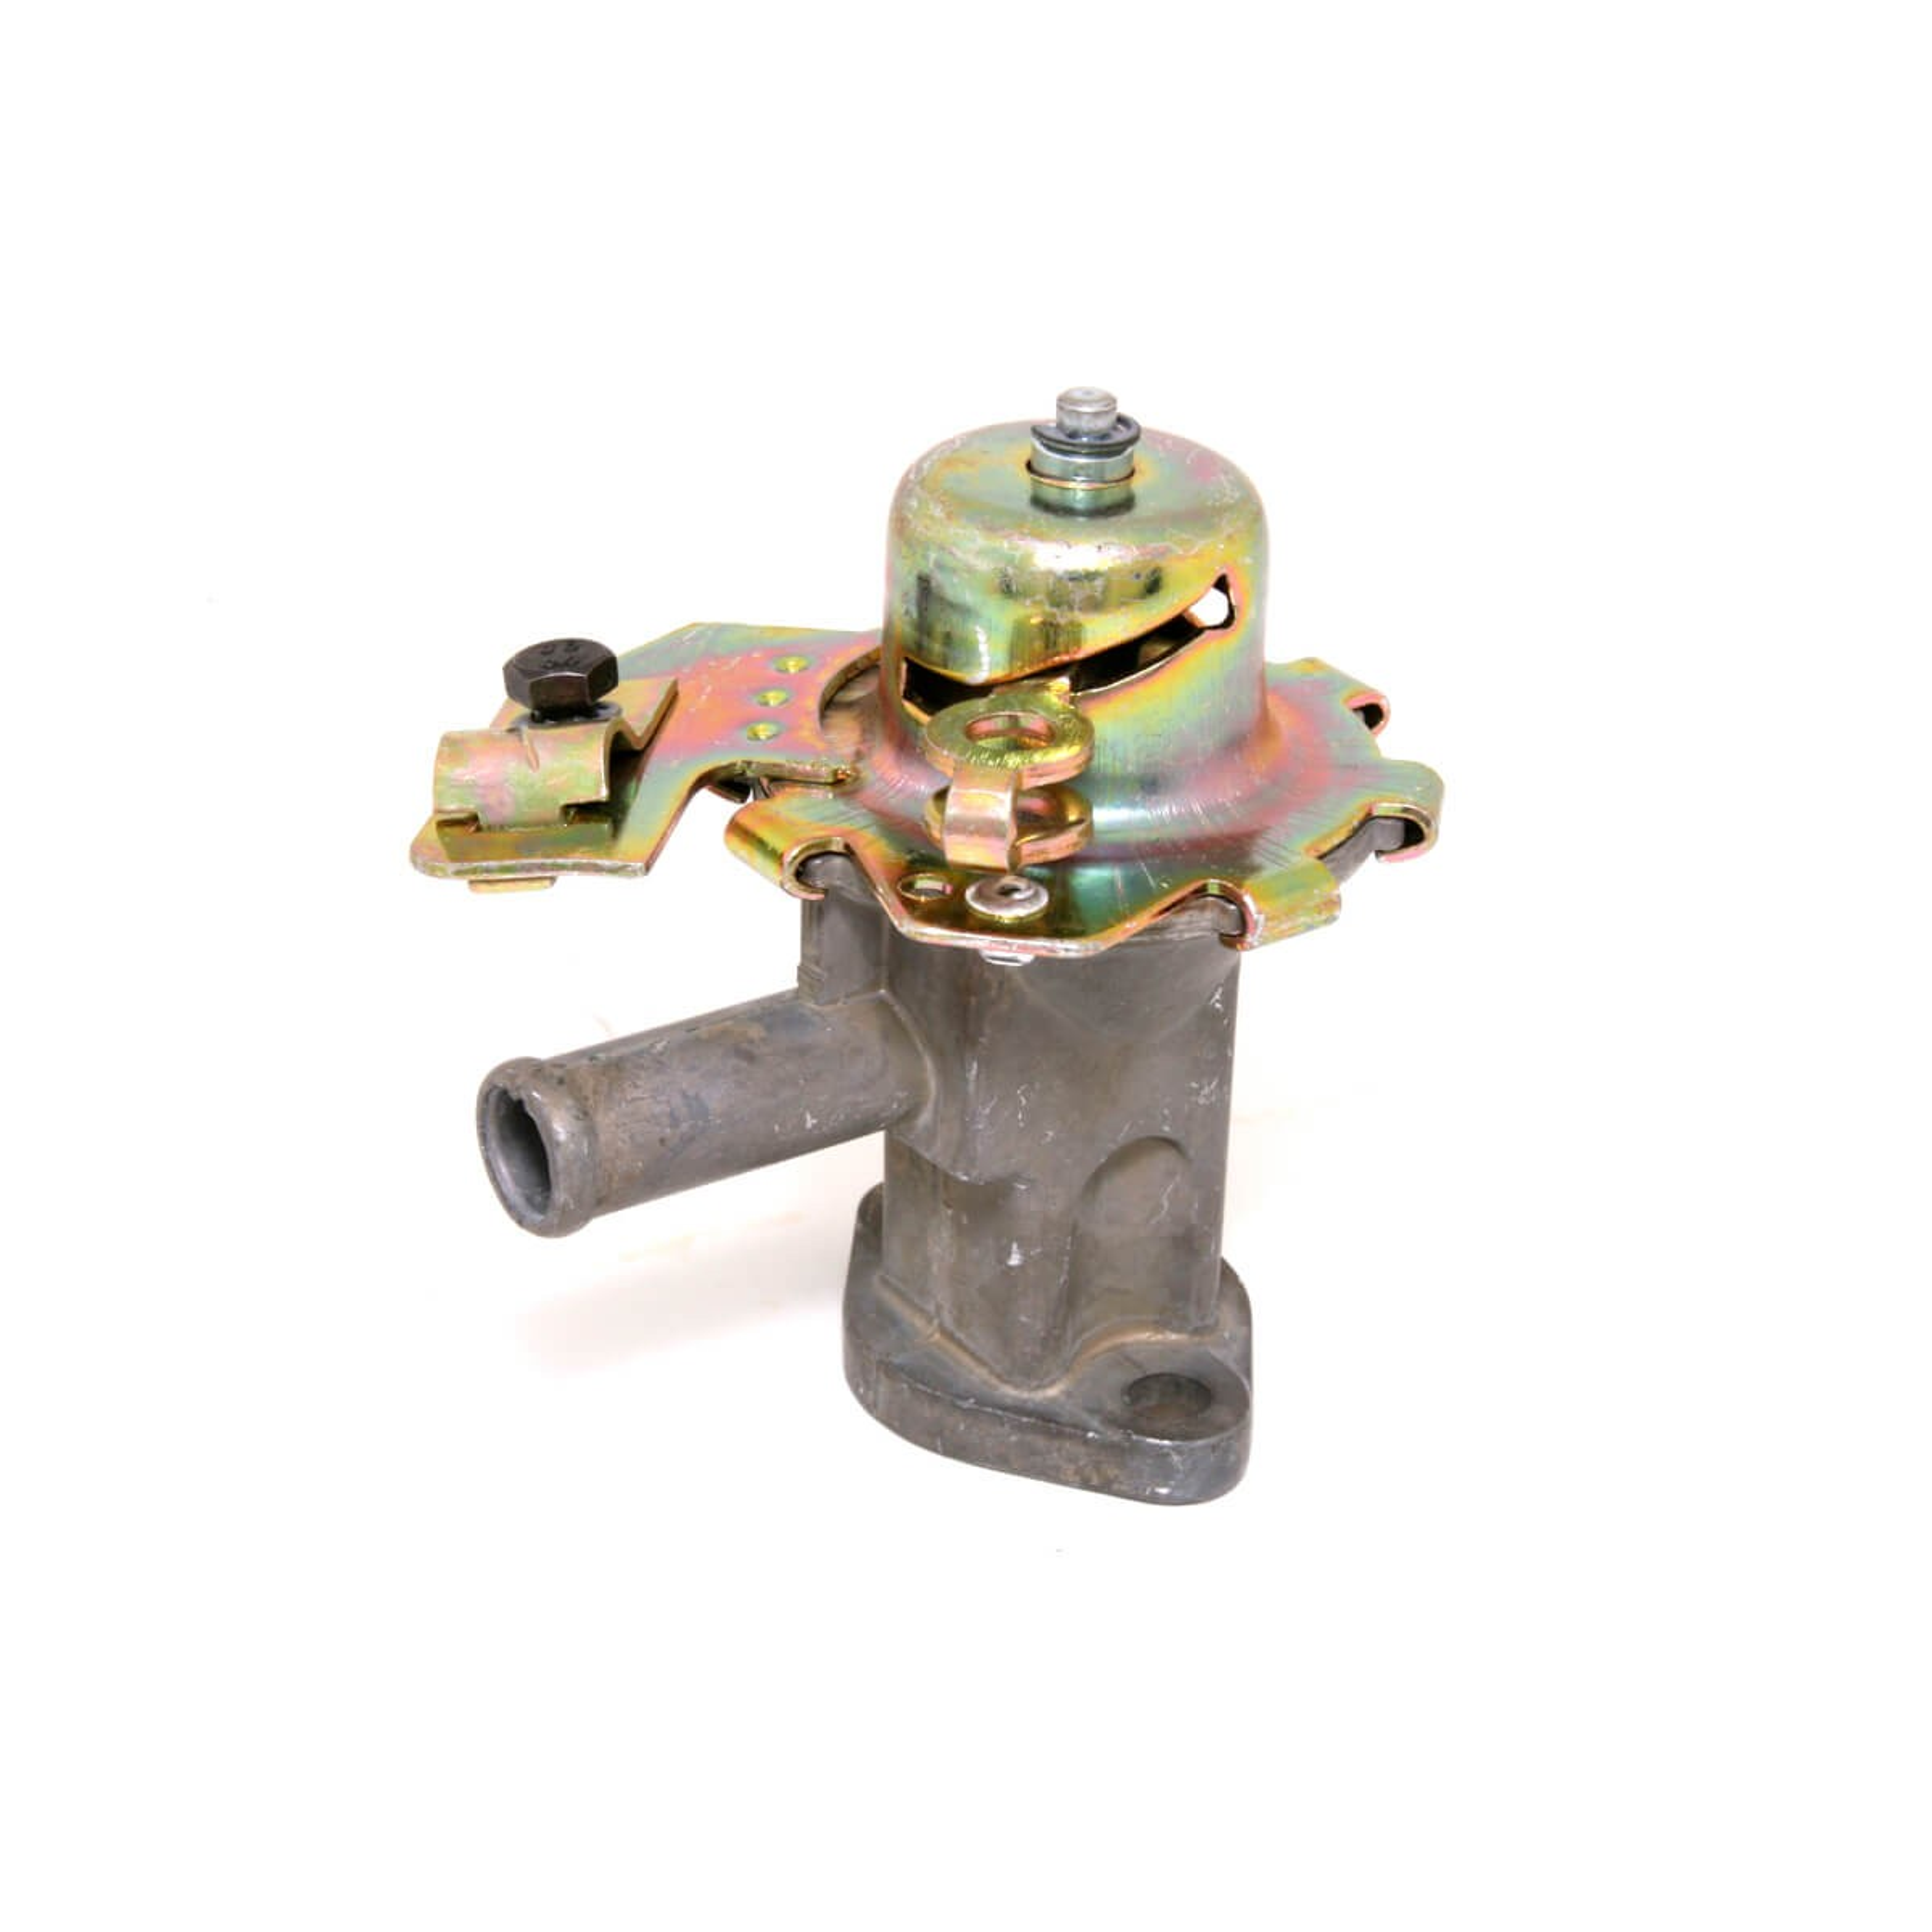 360 410 Heater Shut Off Valve Moss Motors